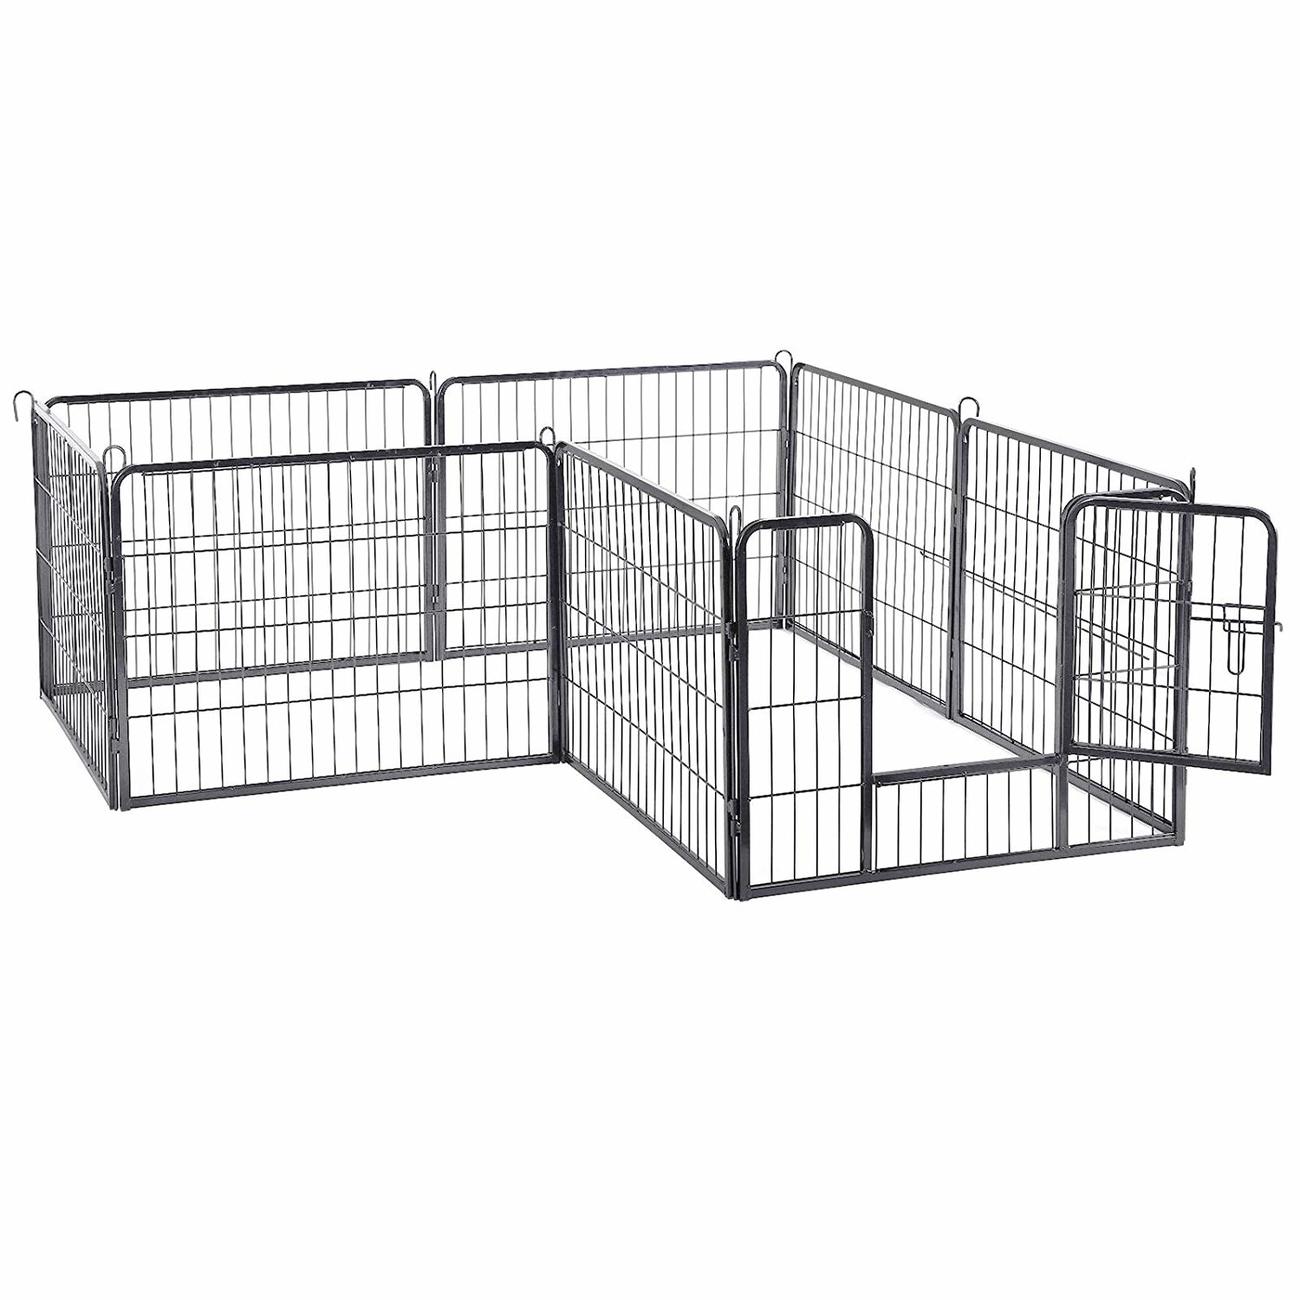 FEANDREA Welpenfreigehege Hundegehege Freilaufgehege 80x60cm, Bild 3